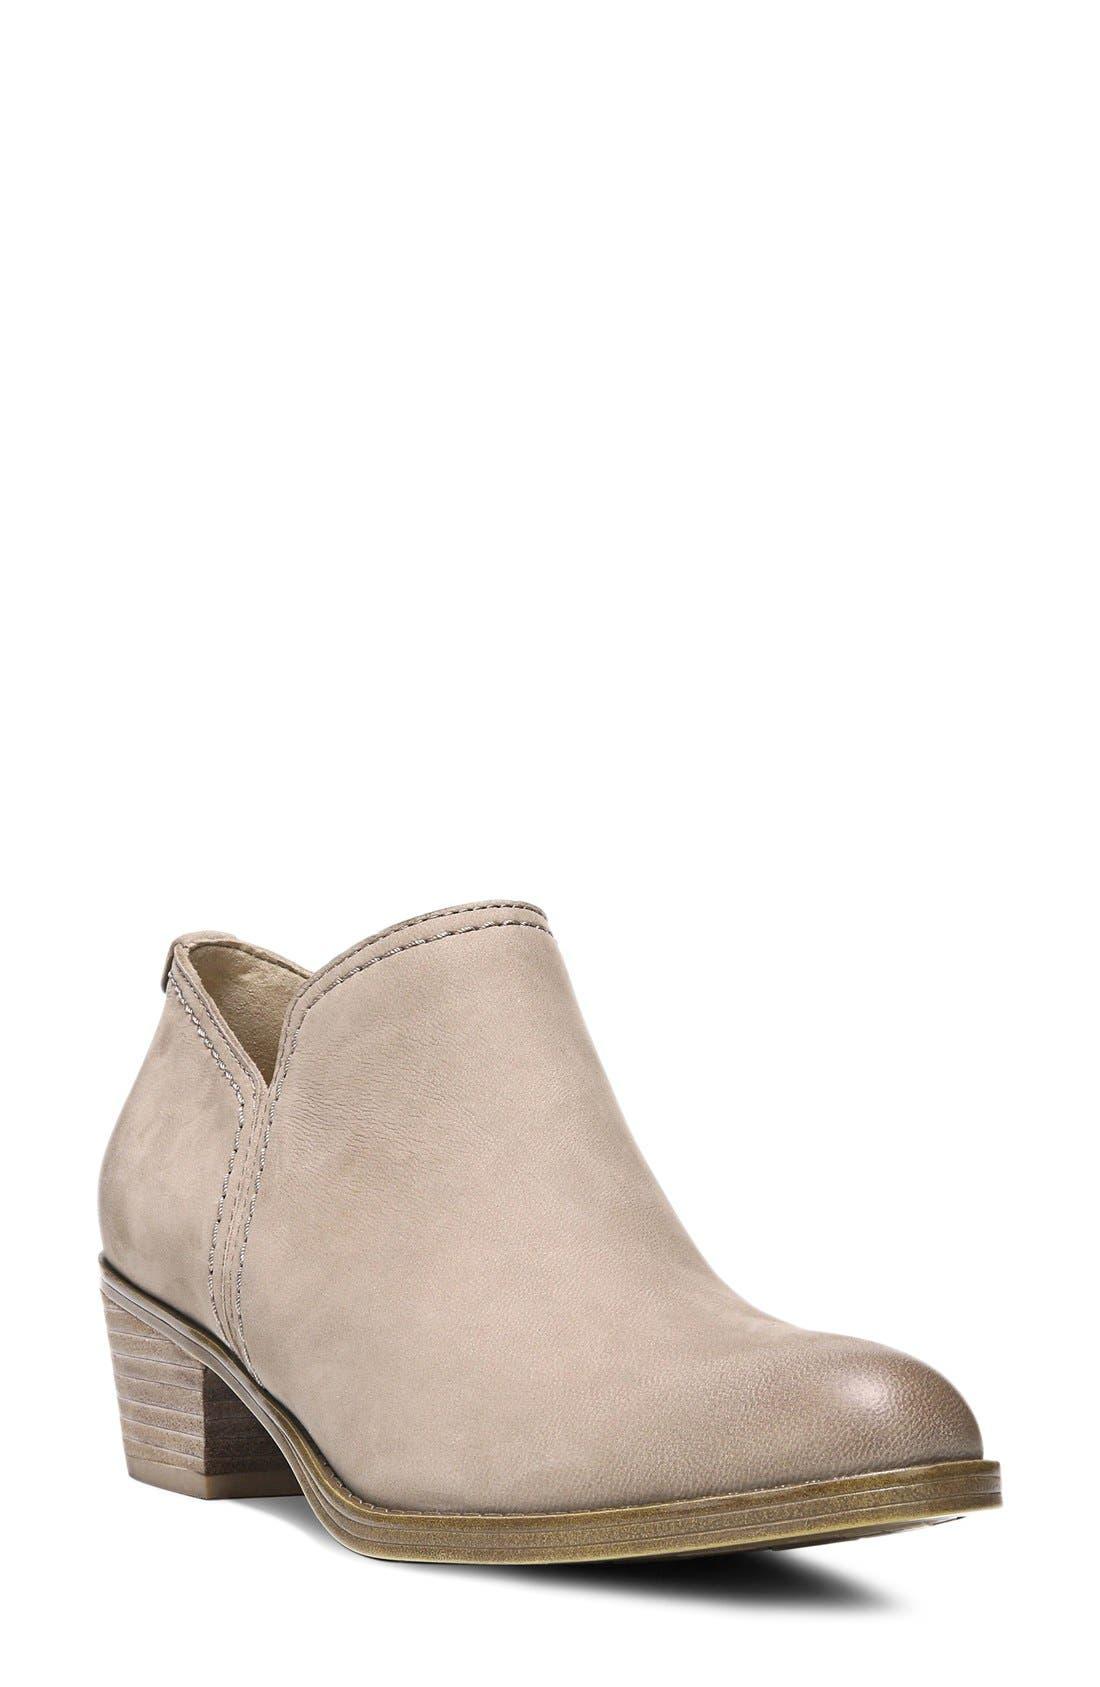 74f5bb28b7c Naturalizer Women's Boots